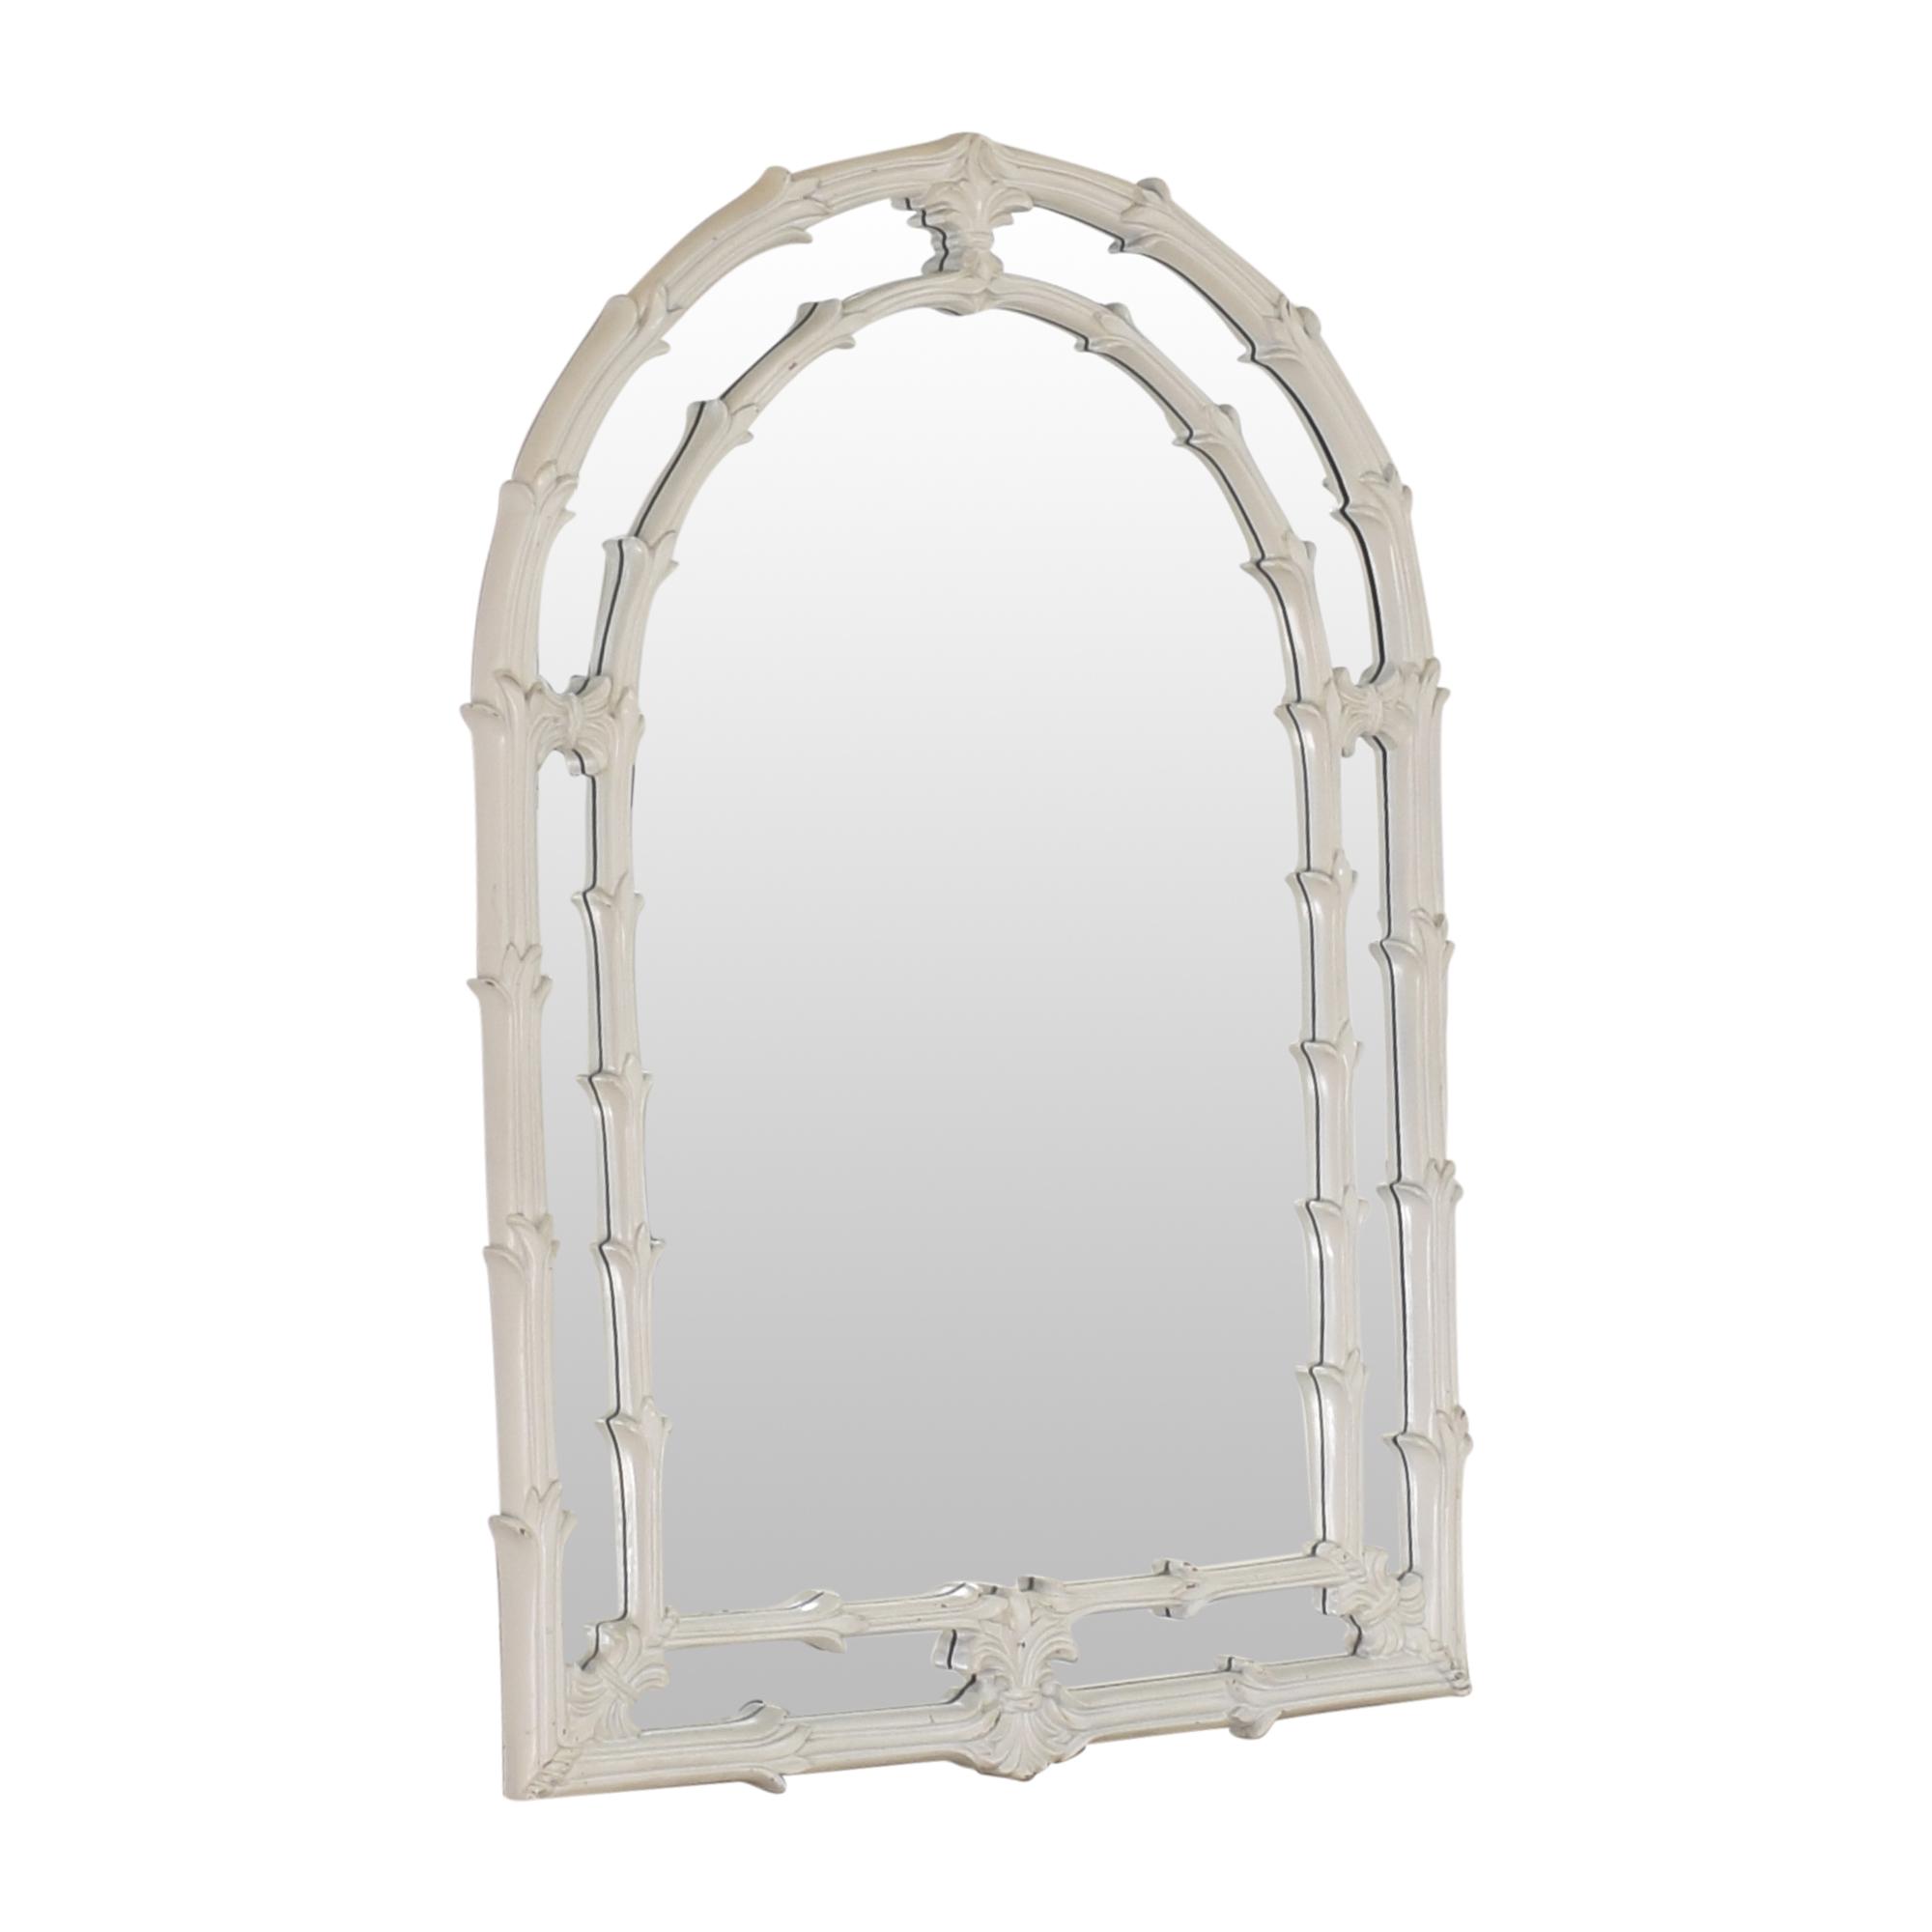 Arch Wall Mirror sale